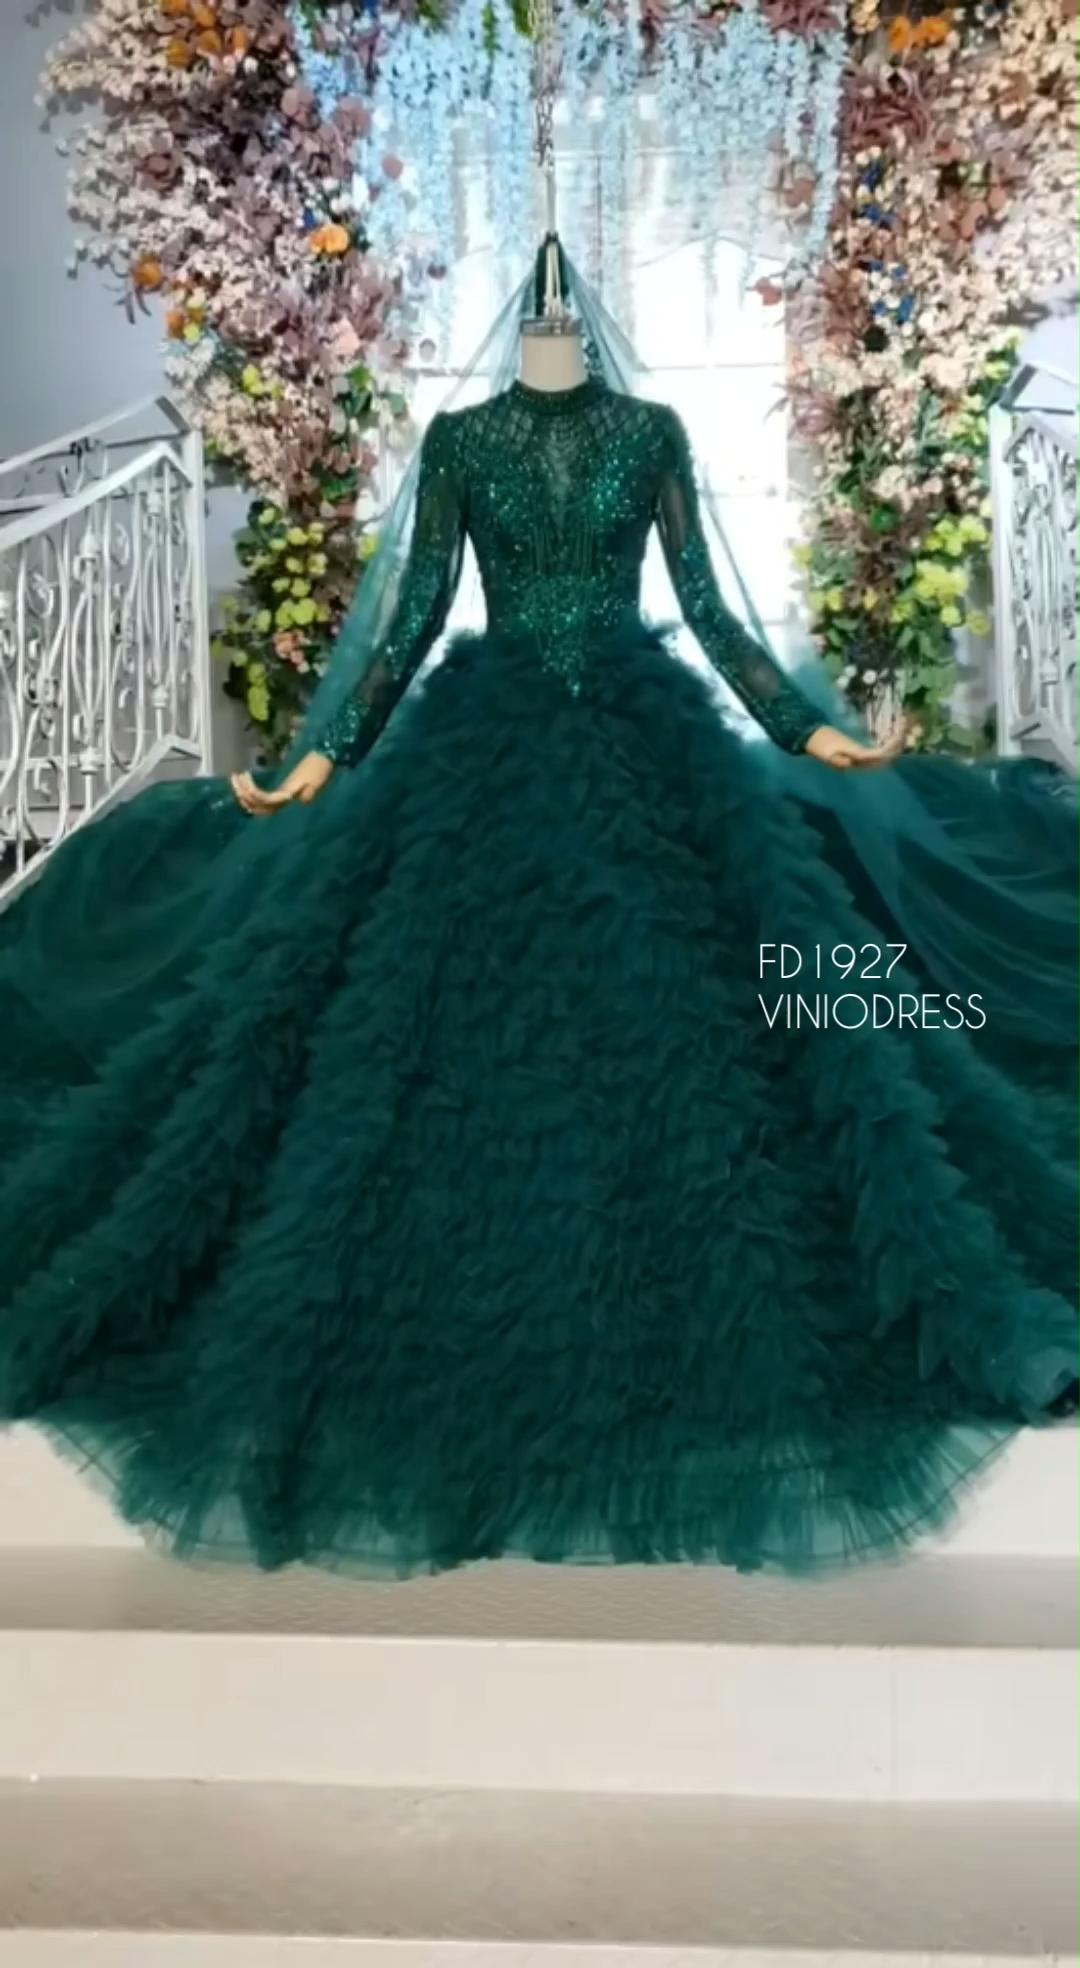 Vintage Long Sleeve Emerald Green Debut Gowns Debutante Sweet15dress Quinceanera Quinceanera Quinceaneradress De Green Wedding Dresses Debut Gowns Gowns [ 1968 x 1080 Pixel ]